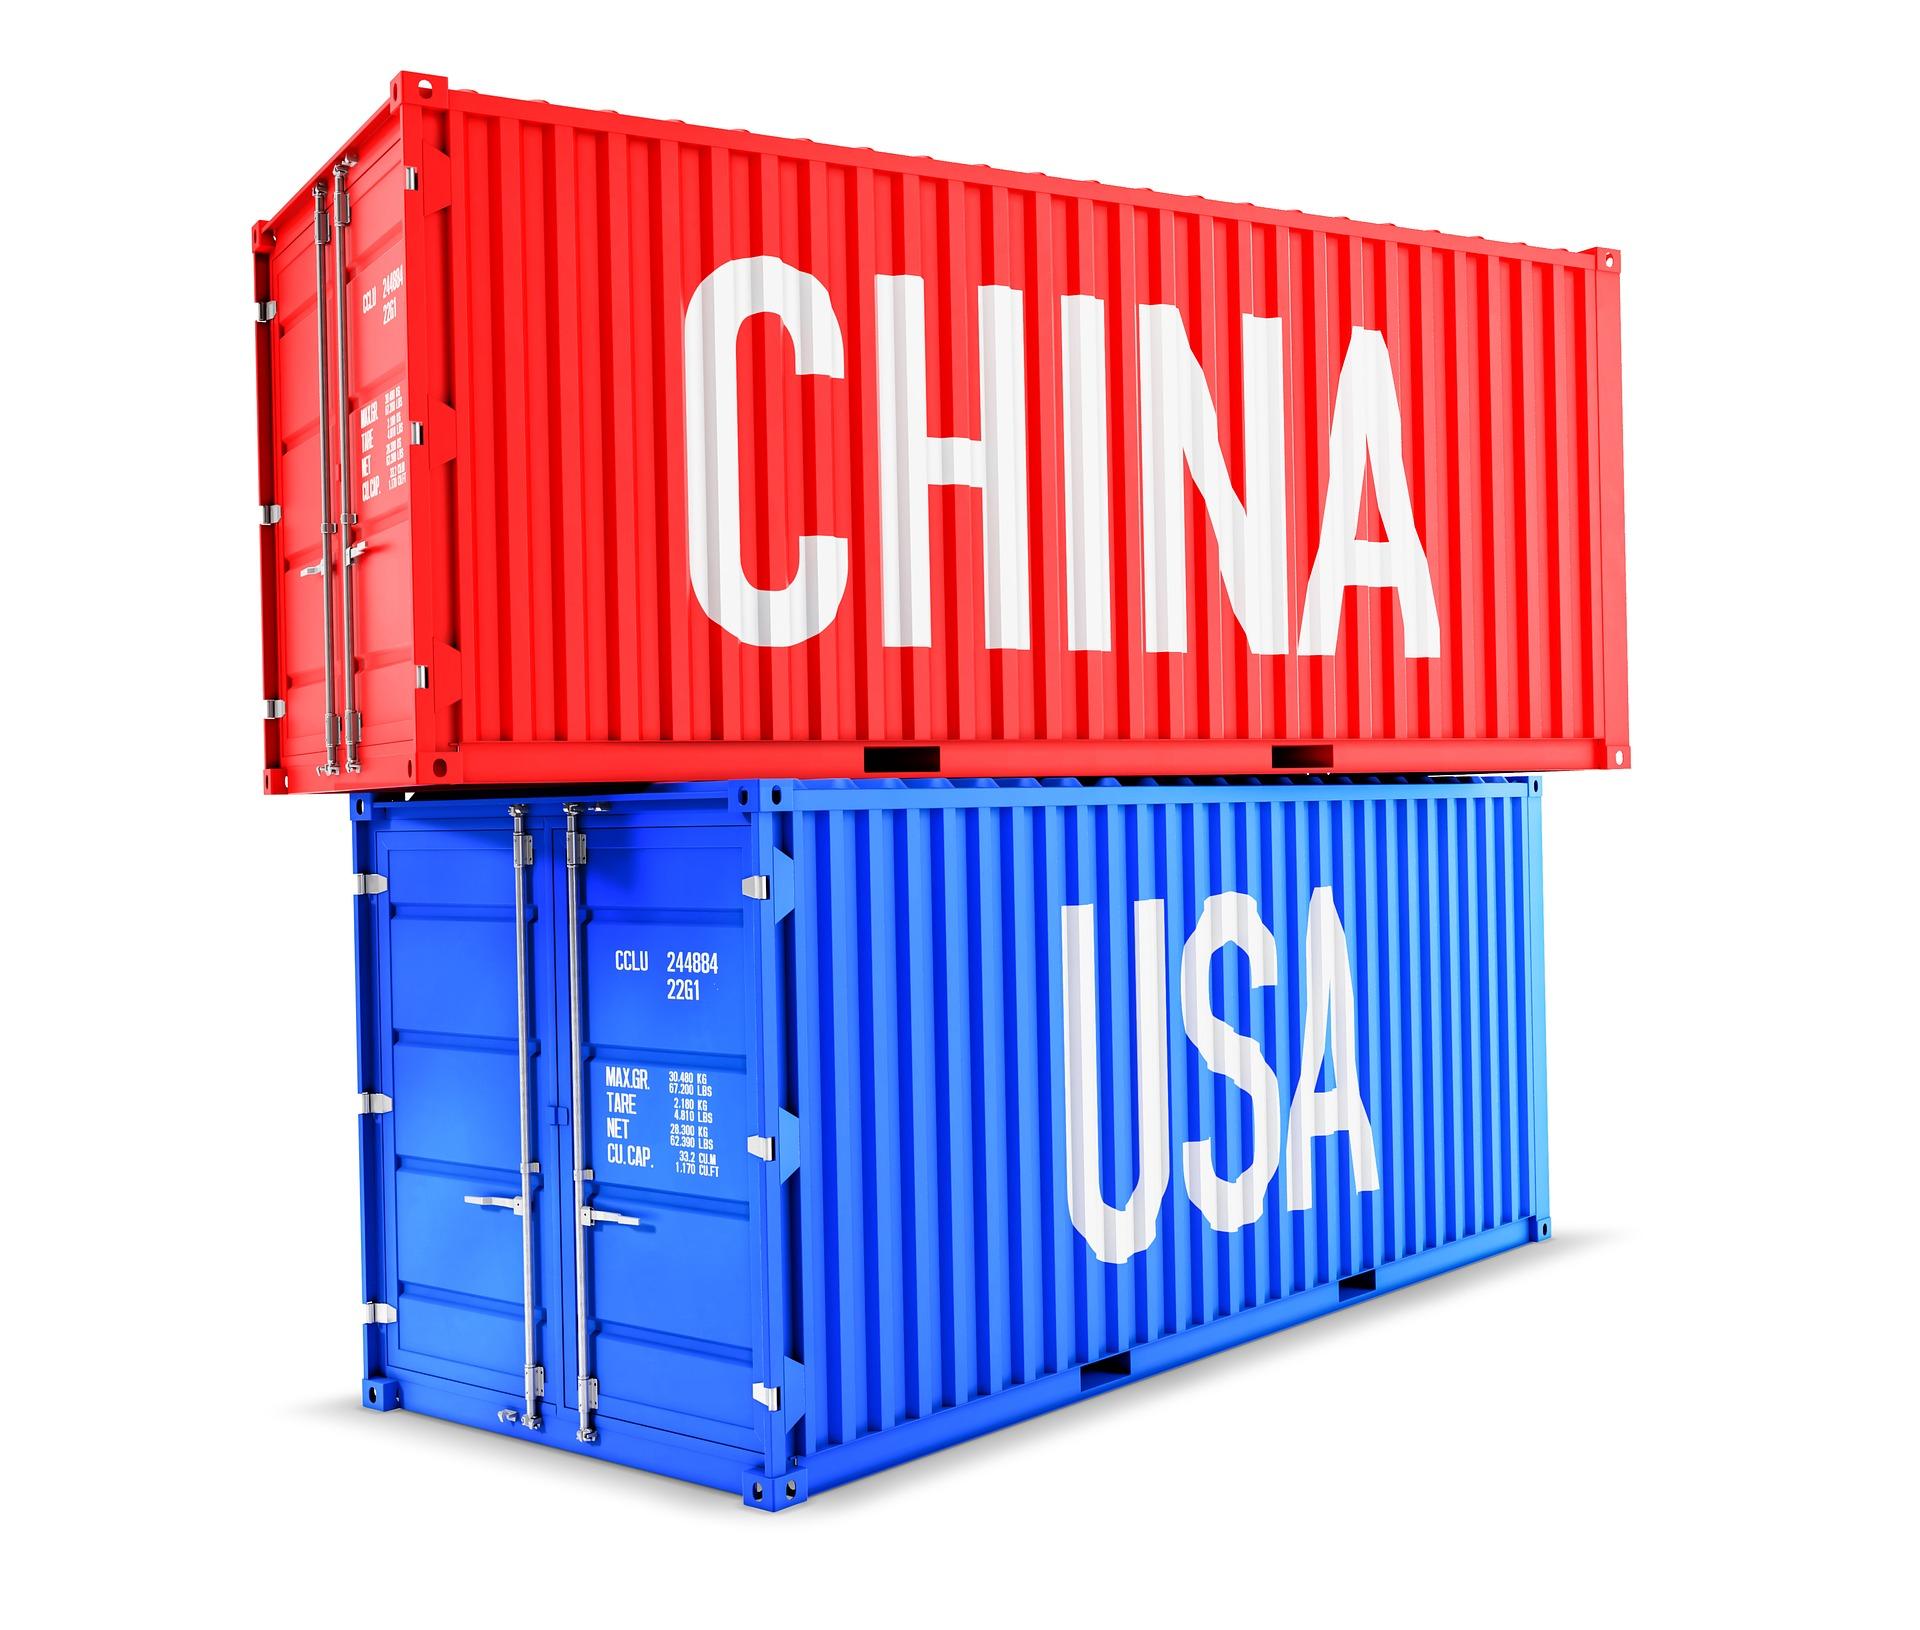 US – China Trade War: Impact on Global Trade